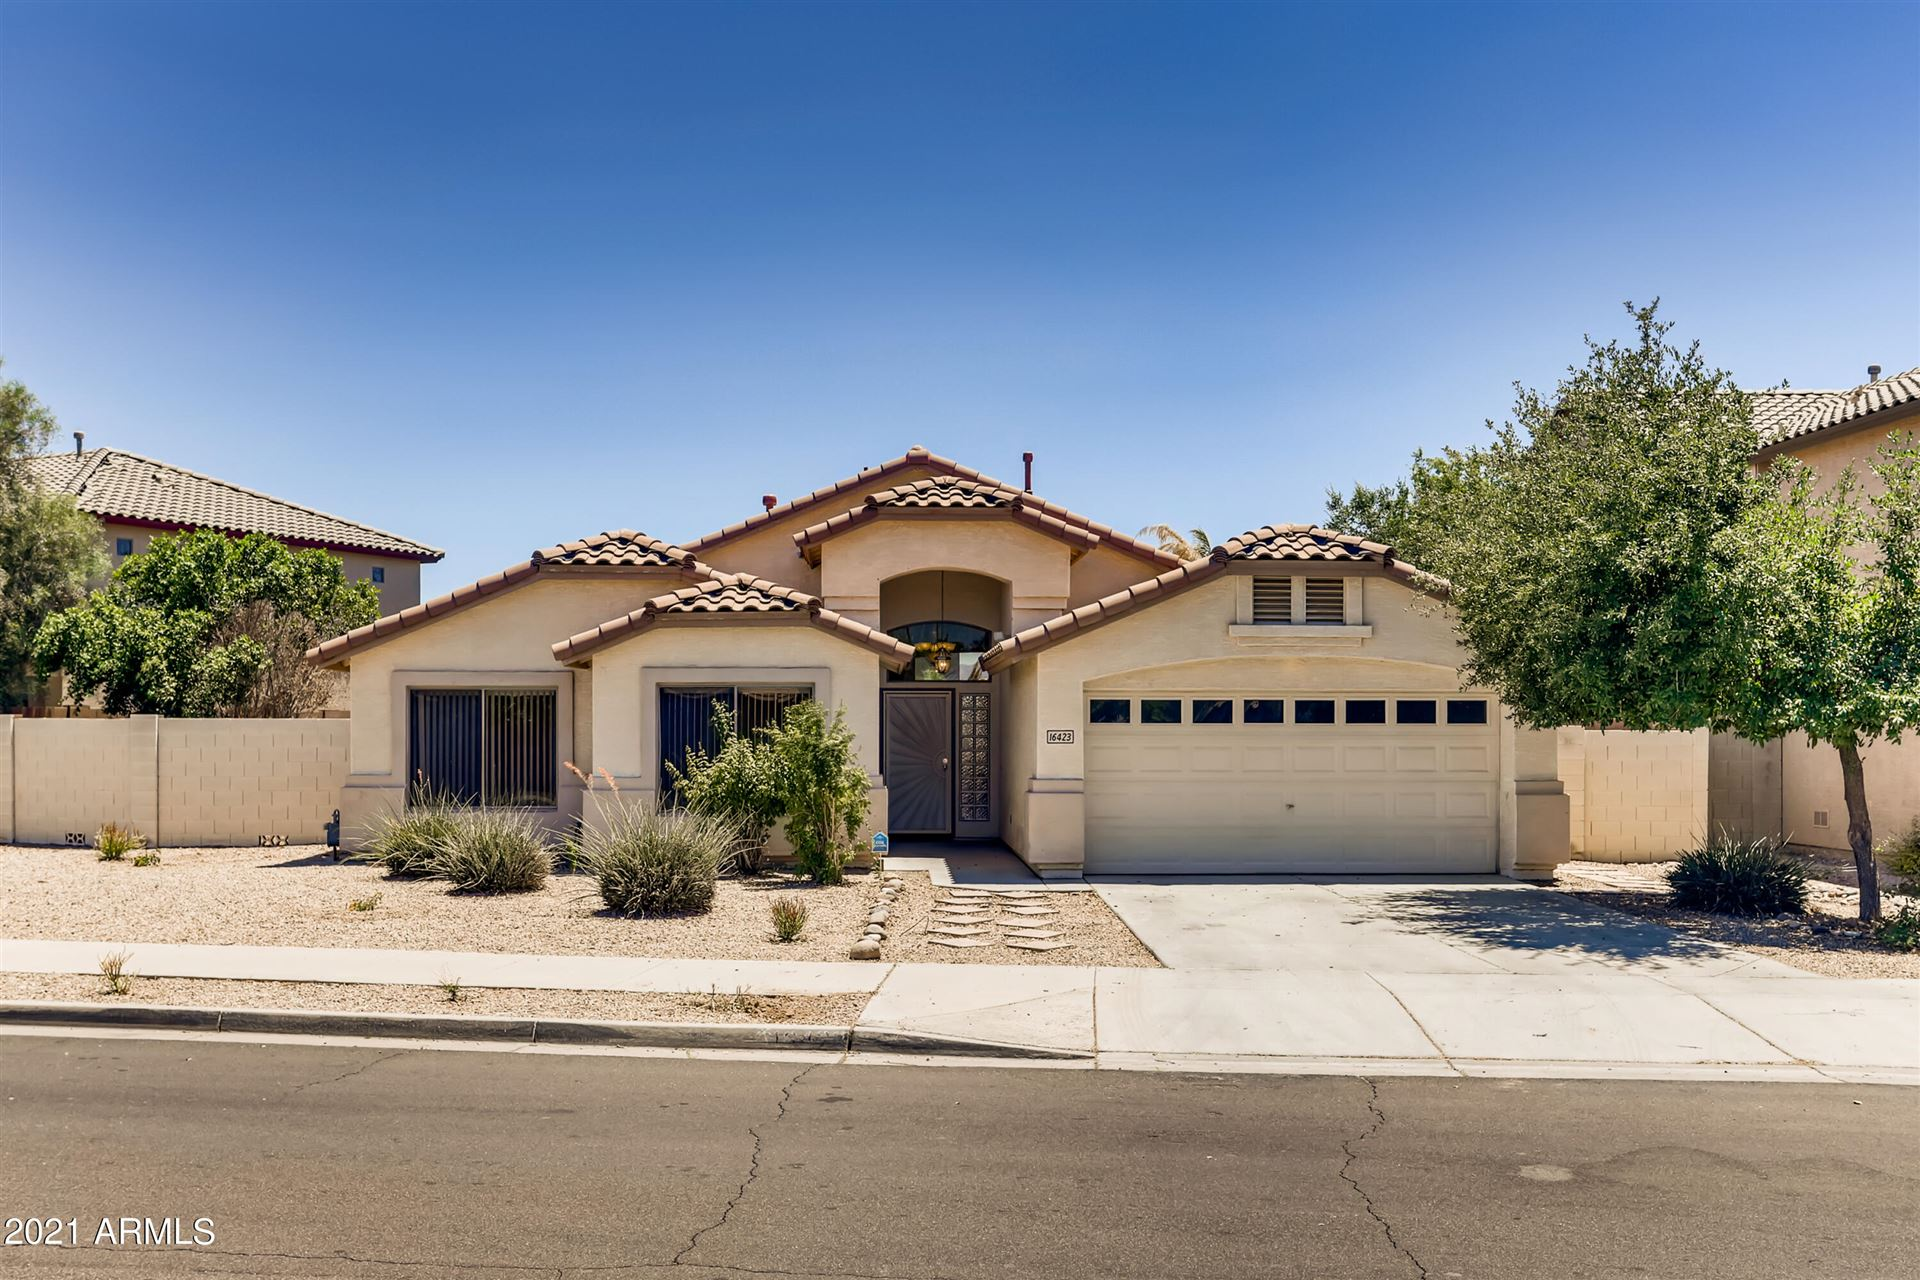 16423 W WOODLANDS Avenue, Goodyear, AZ 85338 - MLS#: 6248961